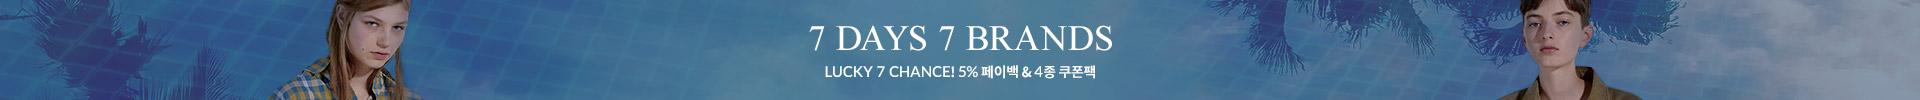 7 DAYS 7 BRANDS